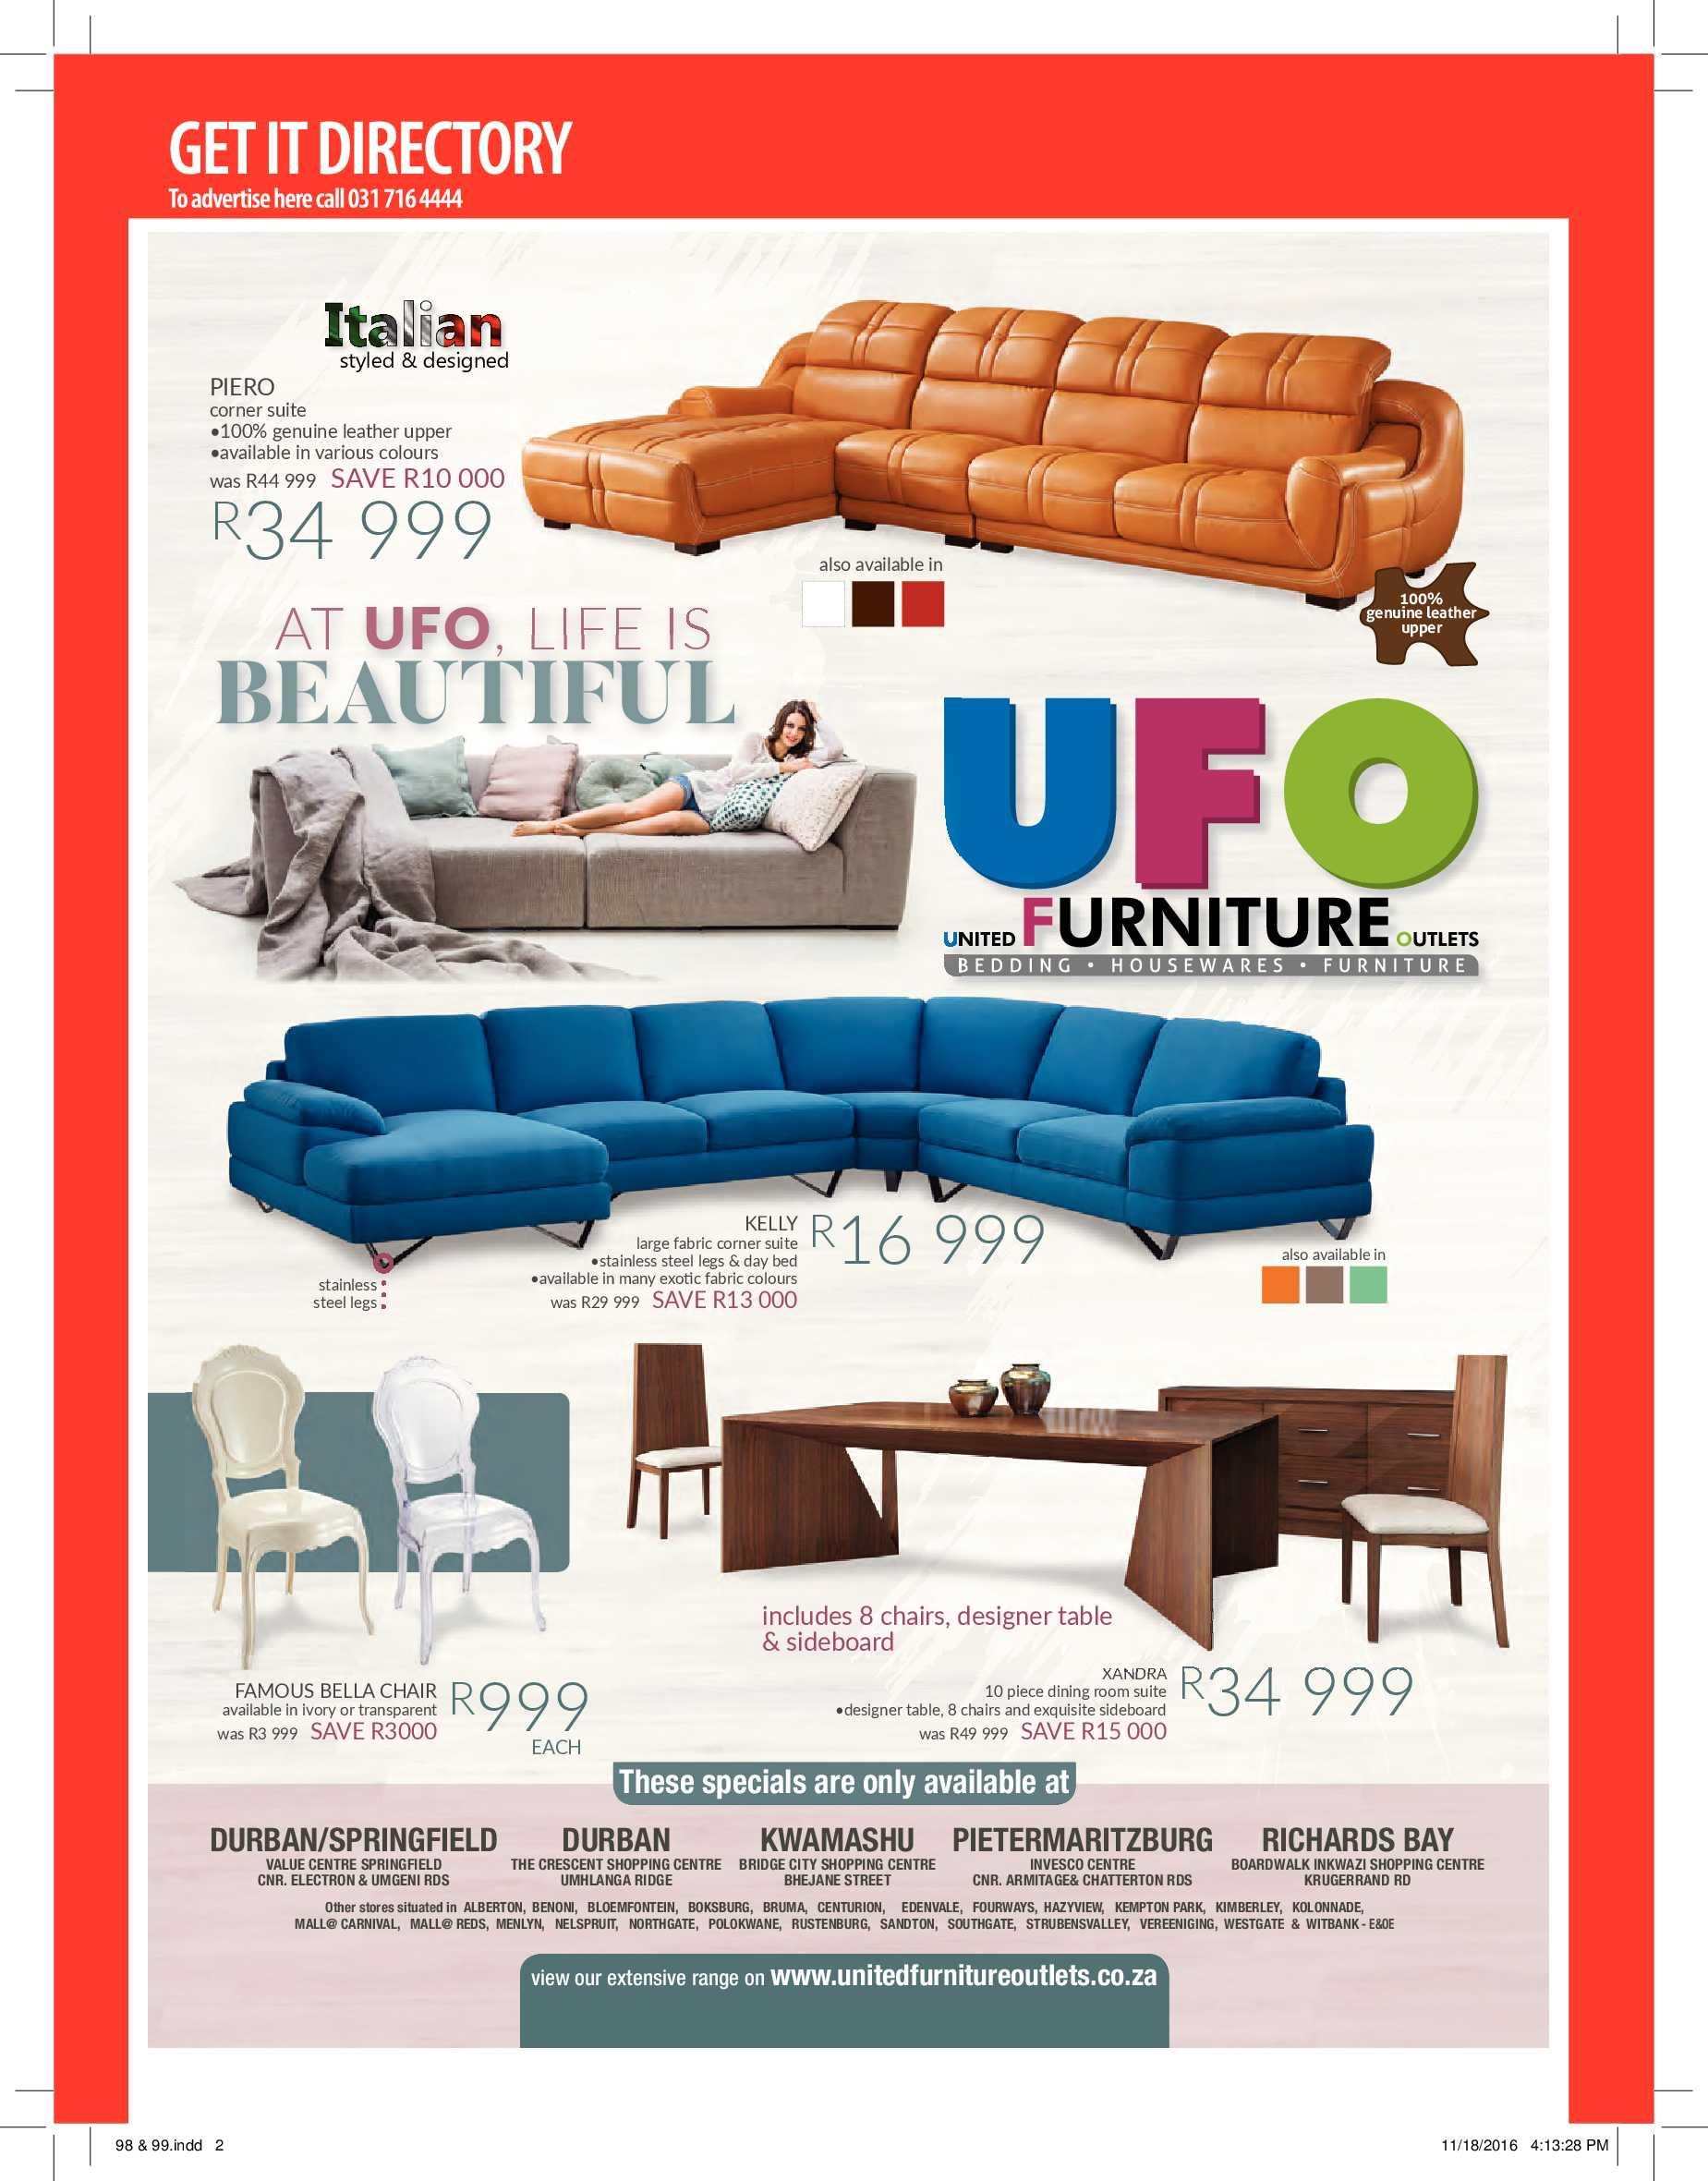 durban-get-it-magazine-december-2016-epapers-page-100